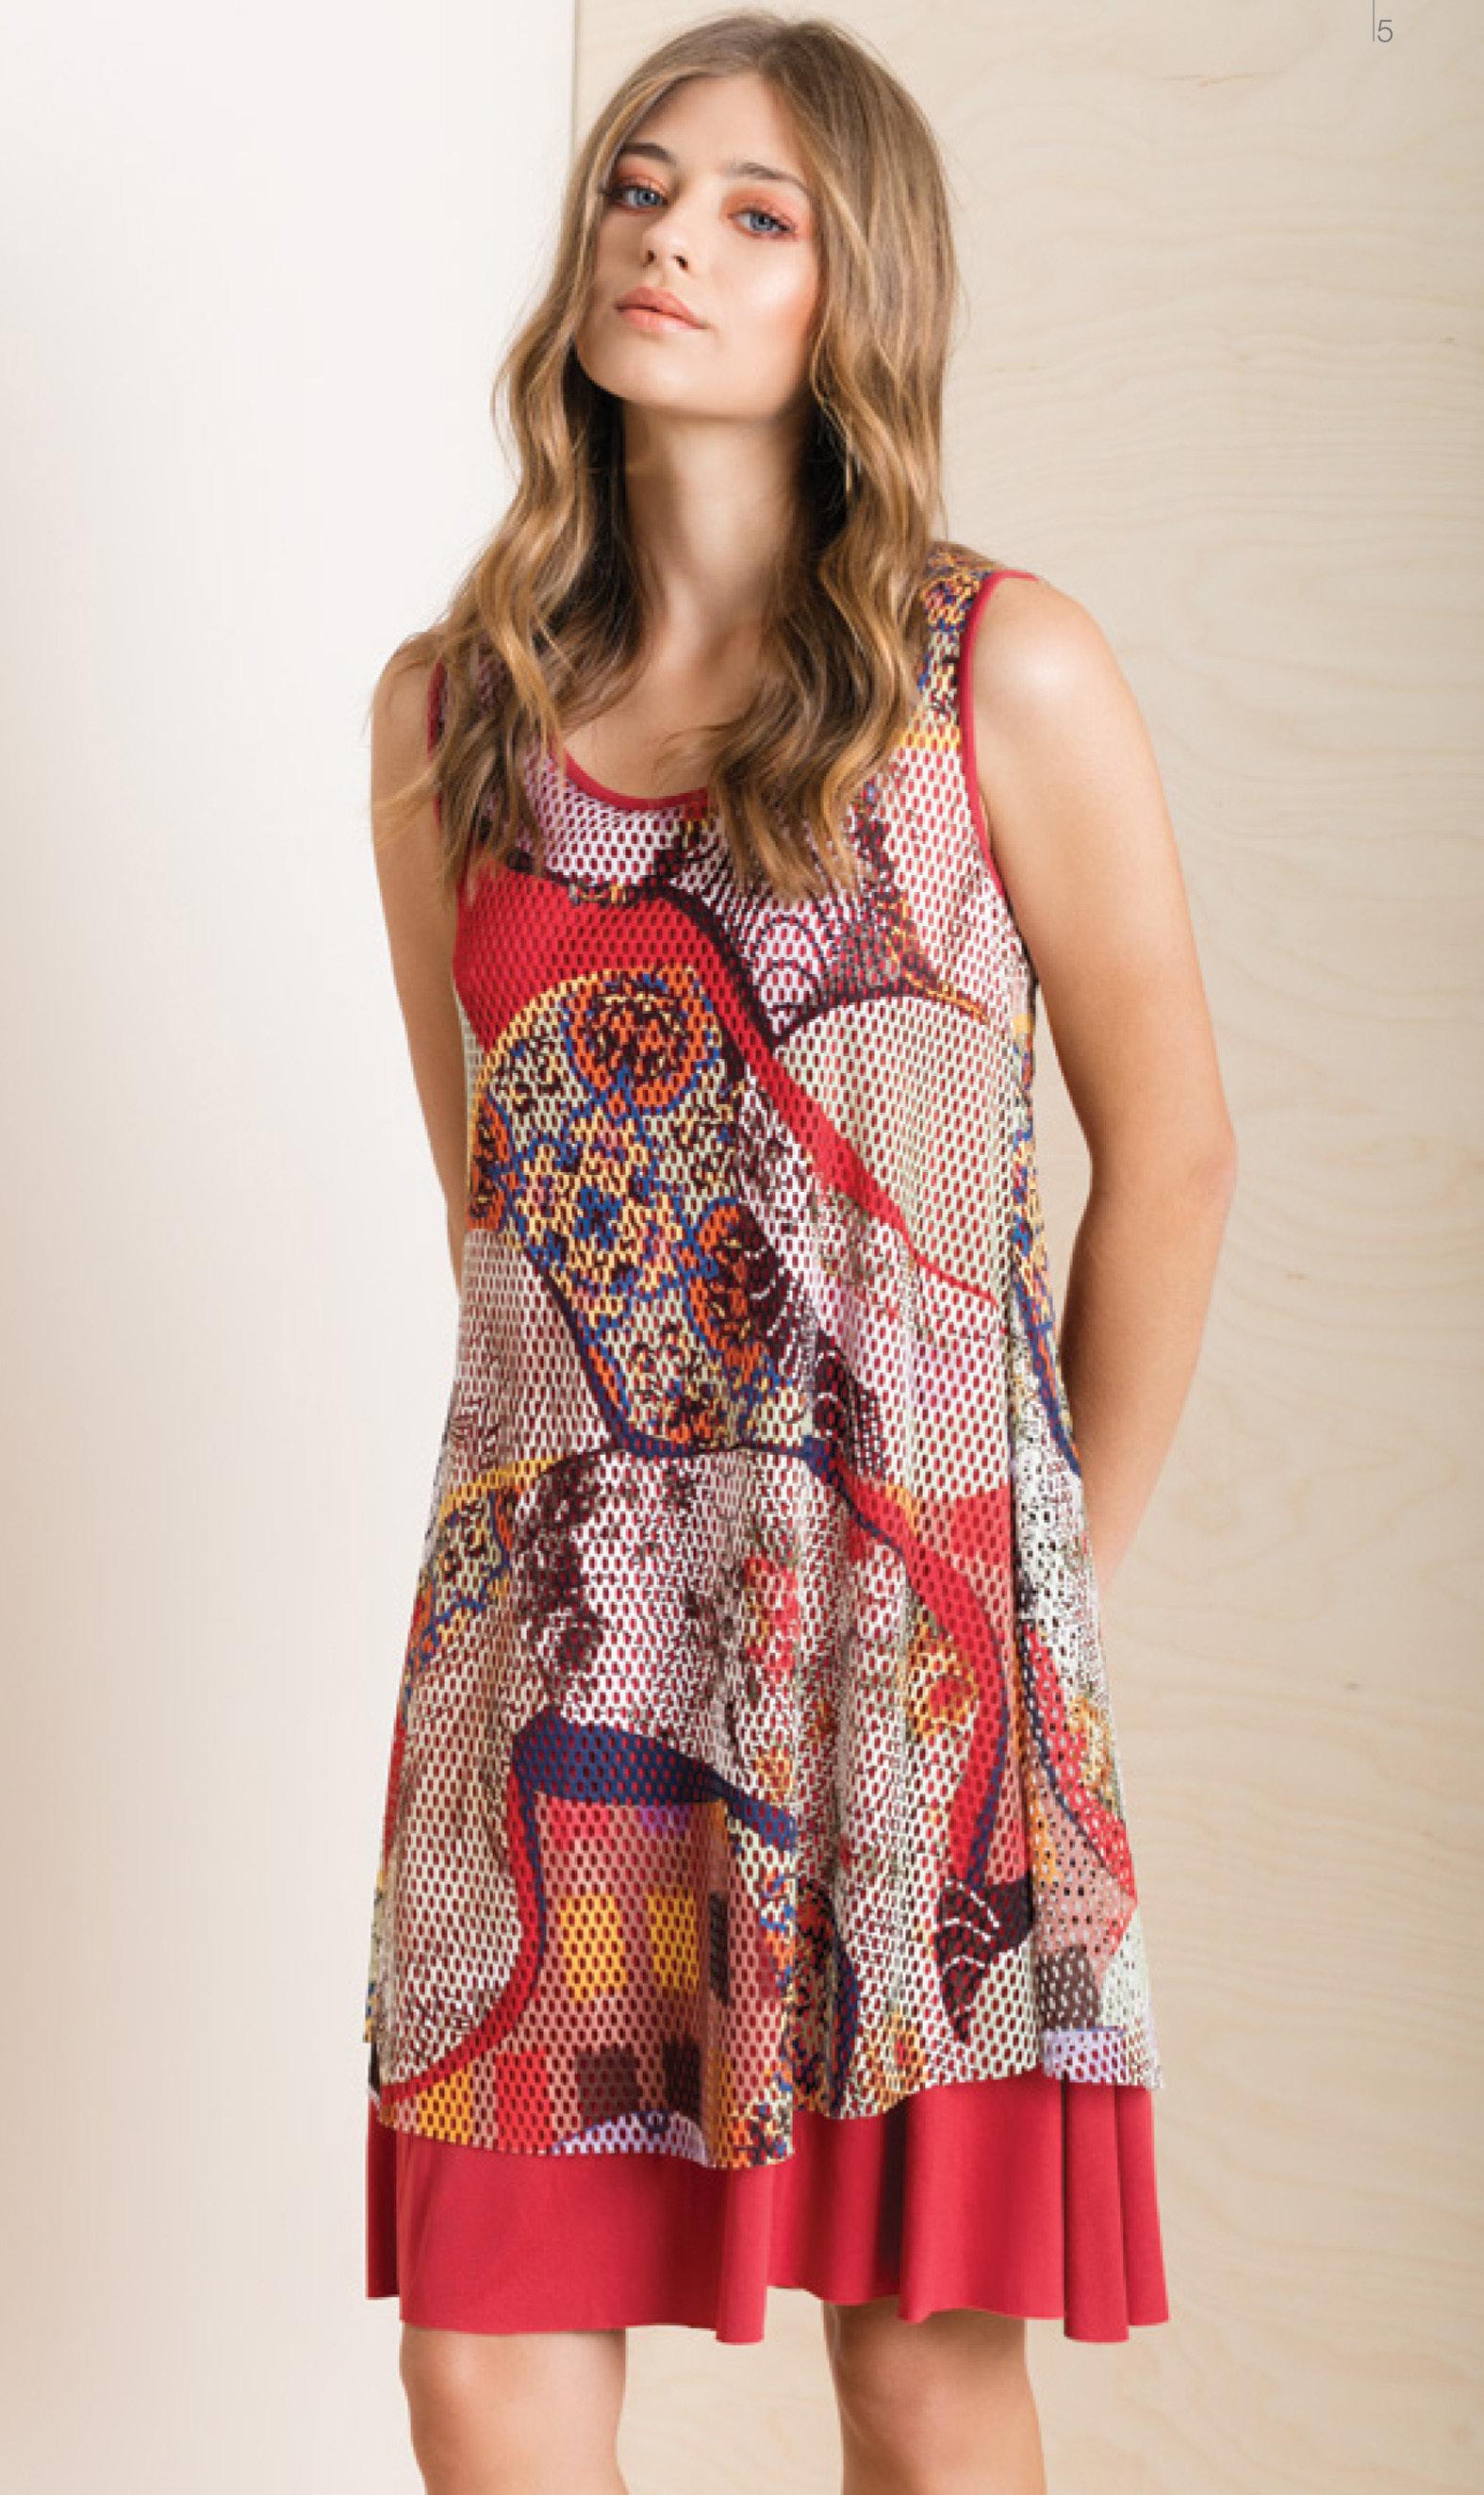 Maloka: Puzzle Pieces Abstract Art Midi Dress (Few Left!) MK_INAYA